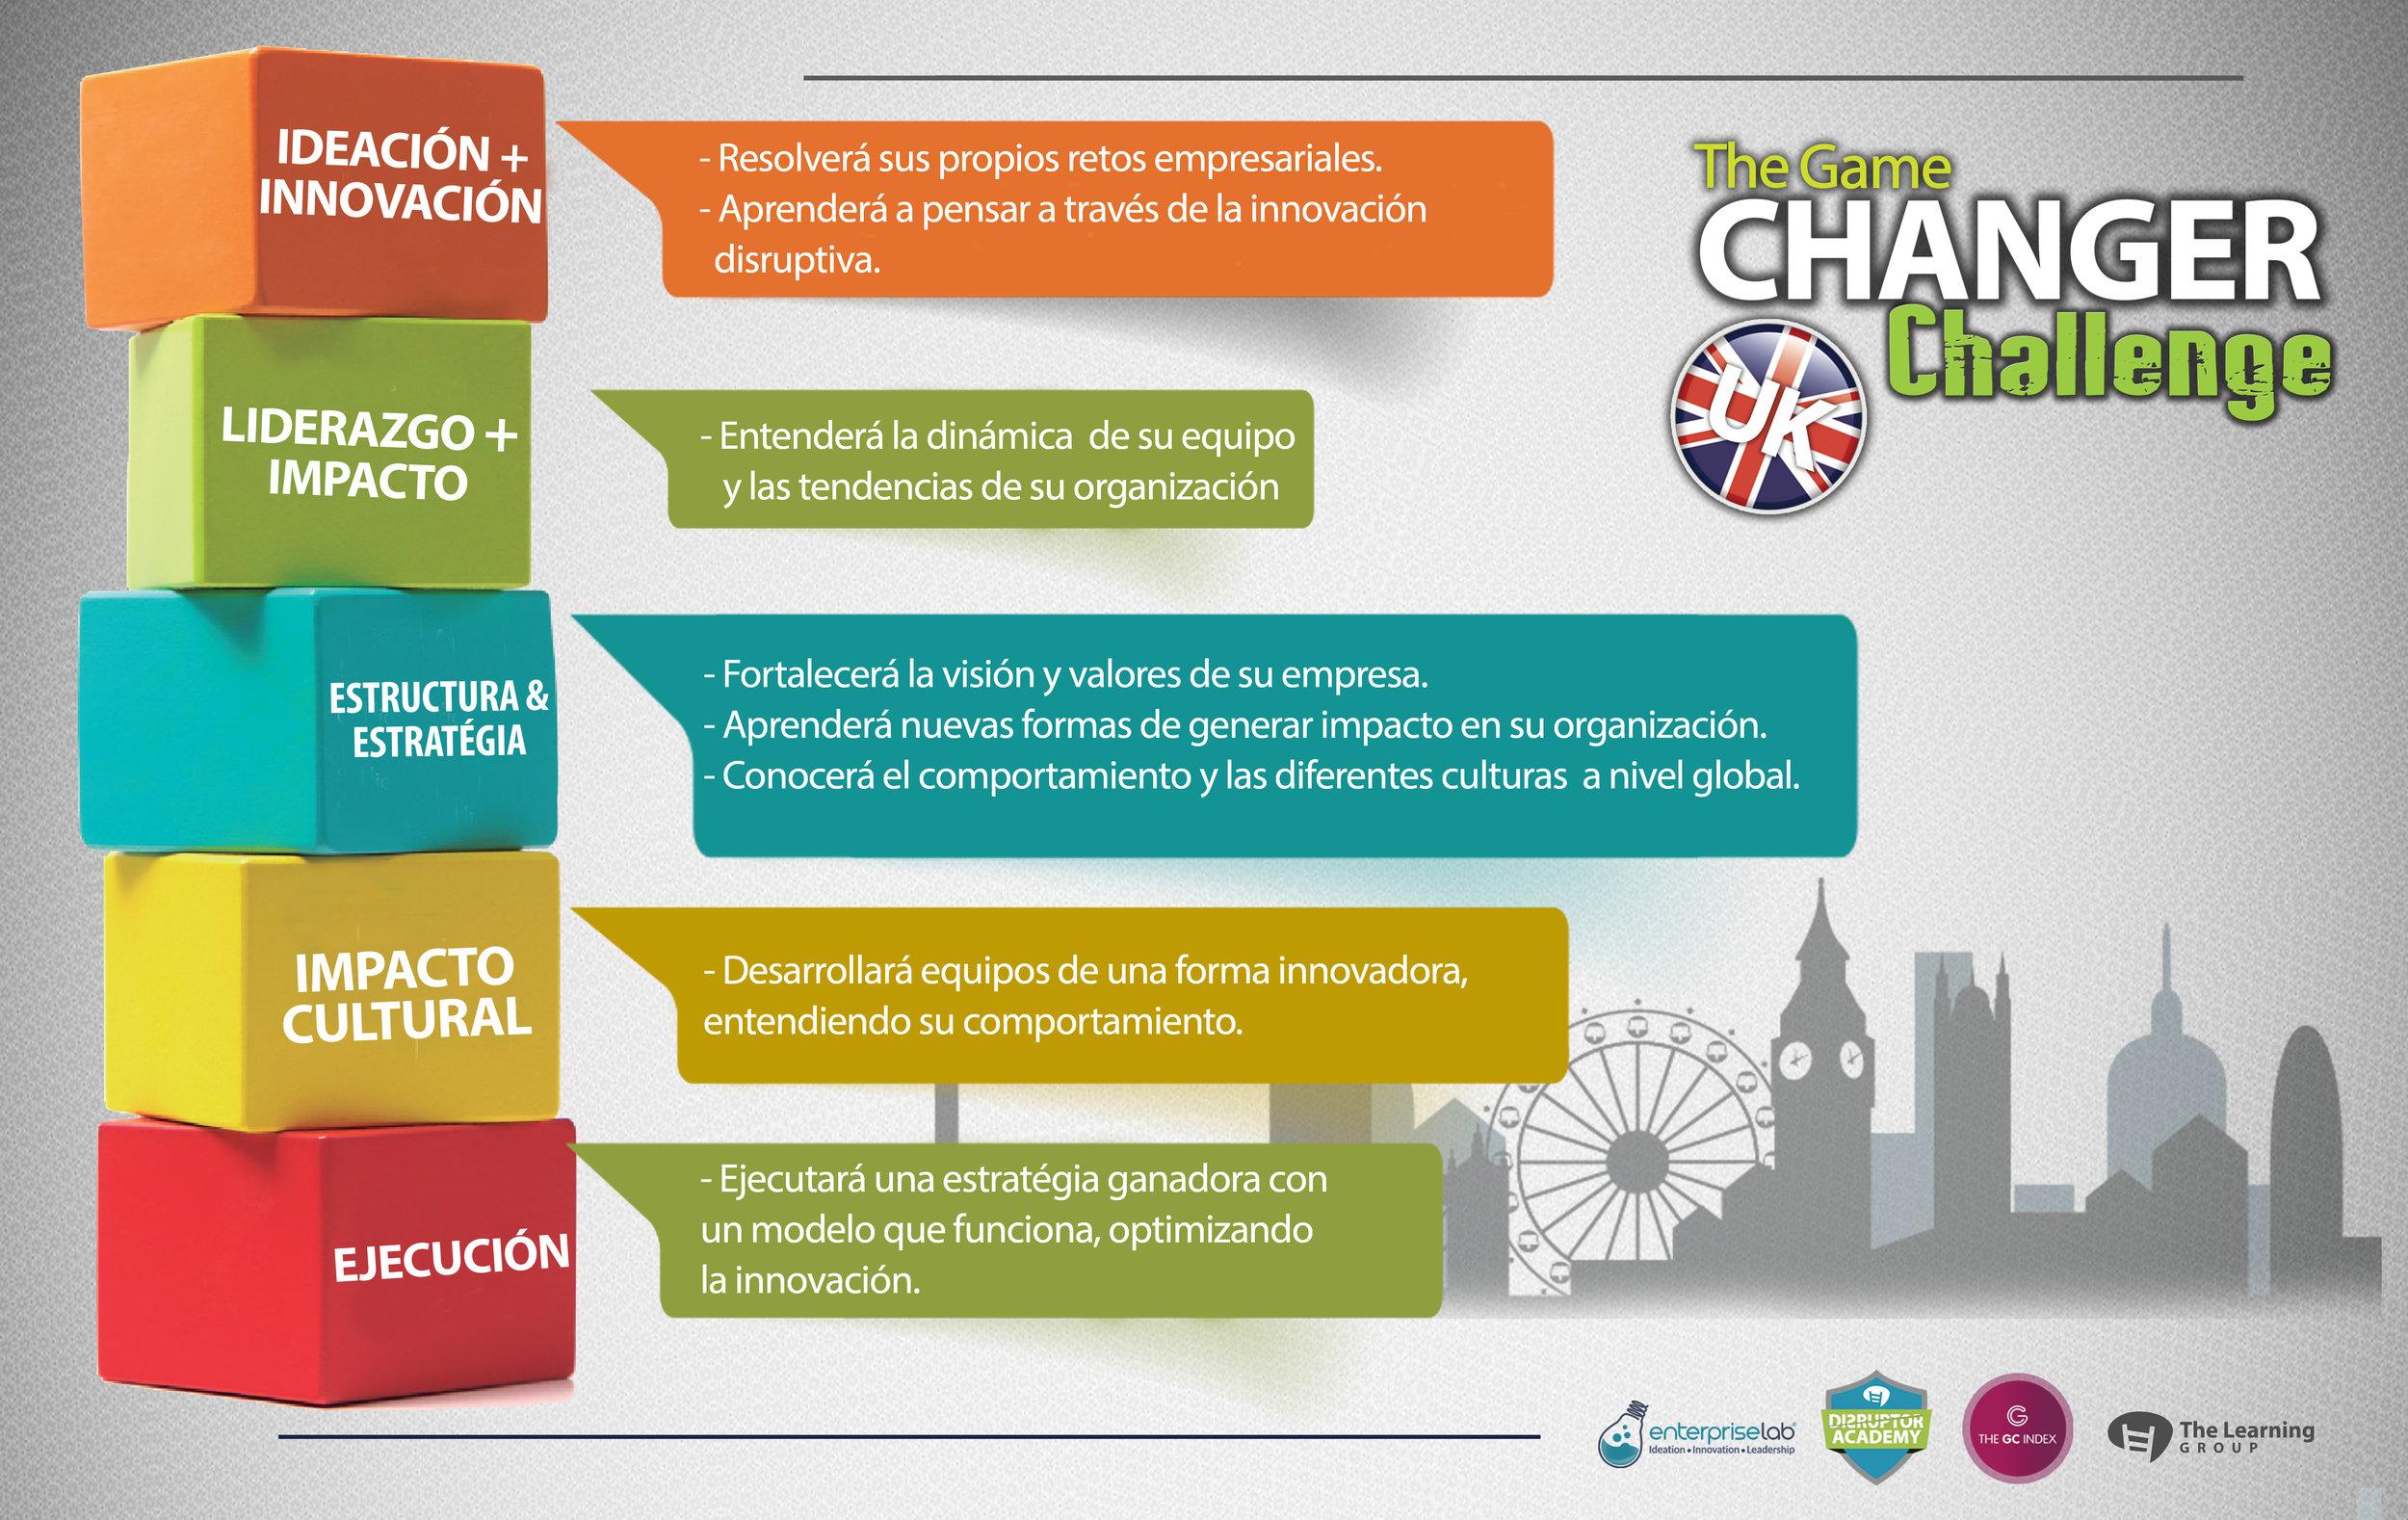 INSIGHTS UK CHALLENGE